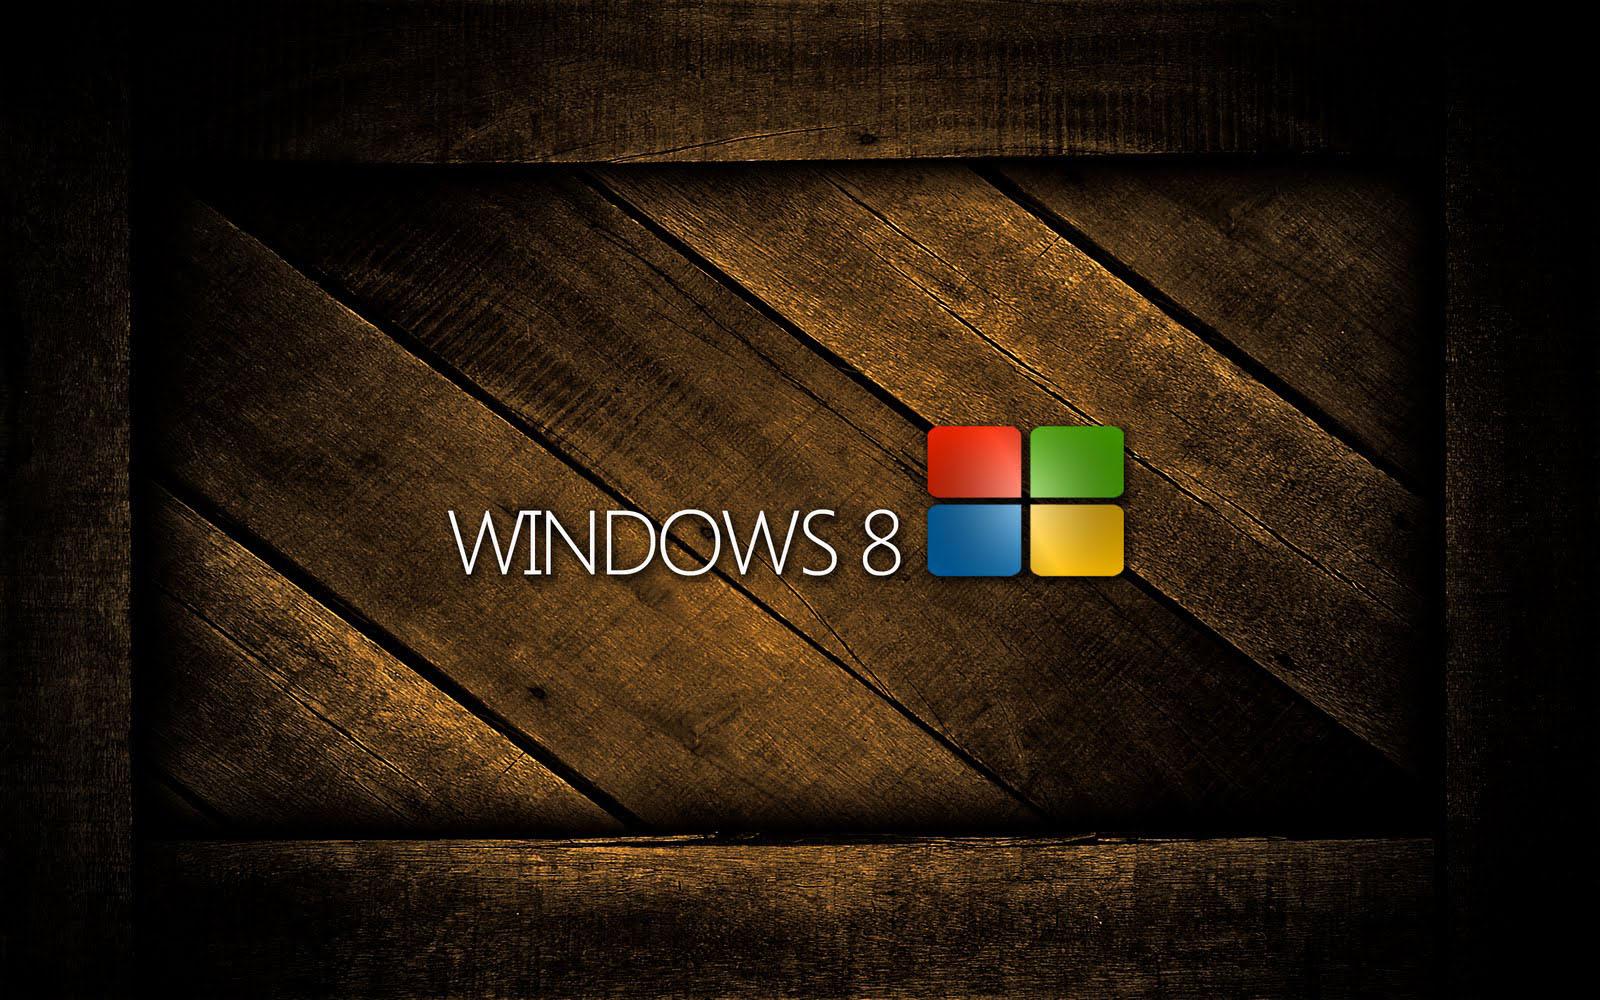 beautiful wallpaper: windows 8 wallpapers free